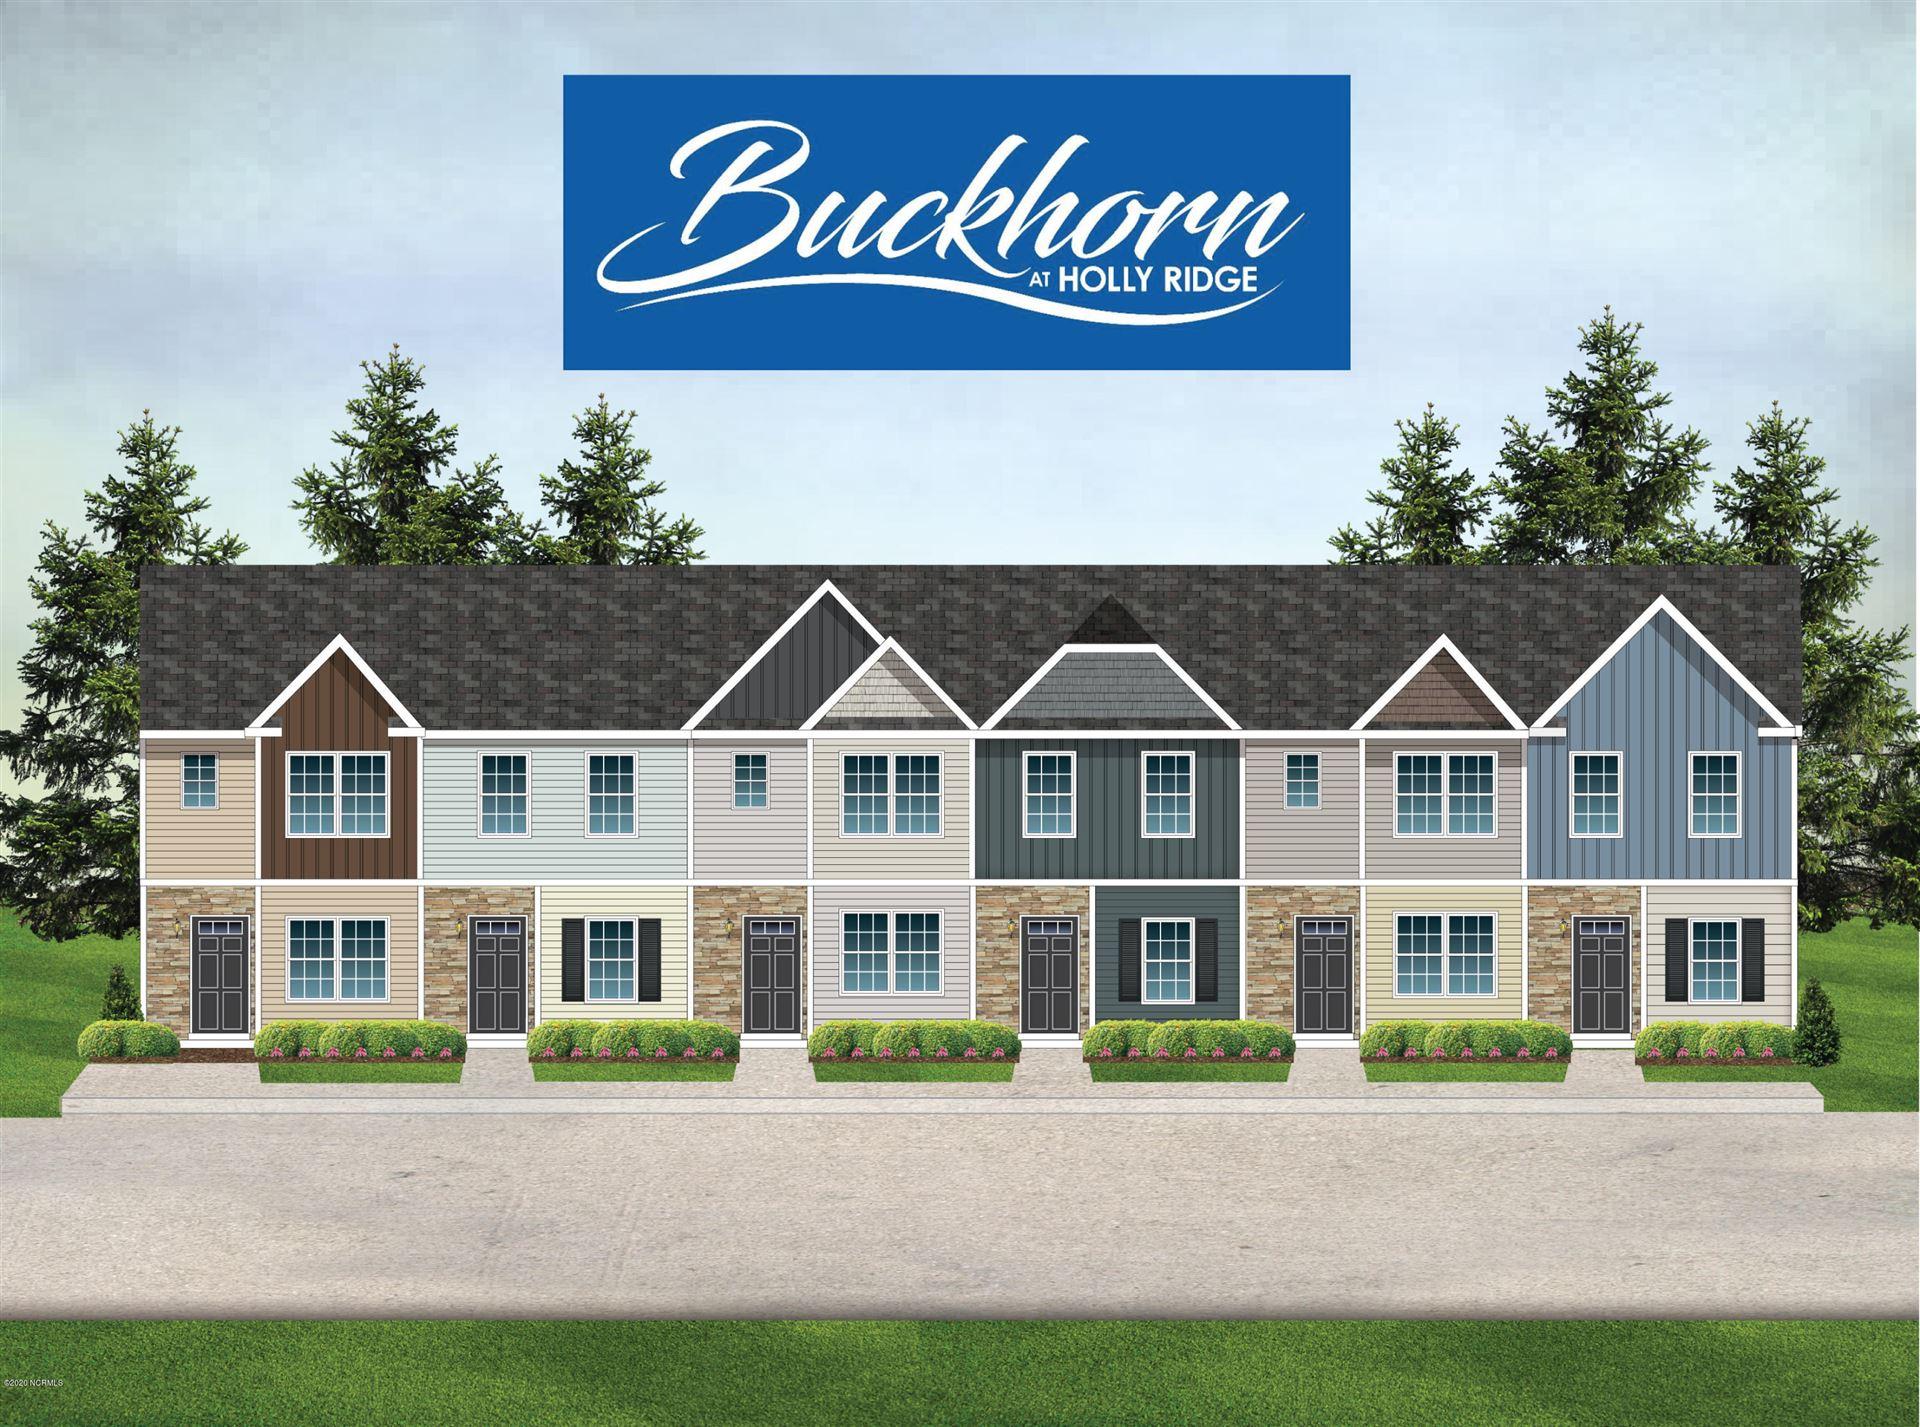 Photo for 128 Buckhorn Avenue, Holly Ridge, NC 28445 (MLS # 100224898)